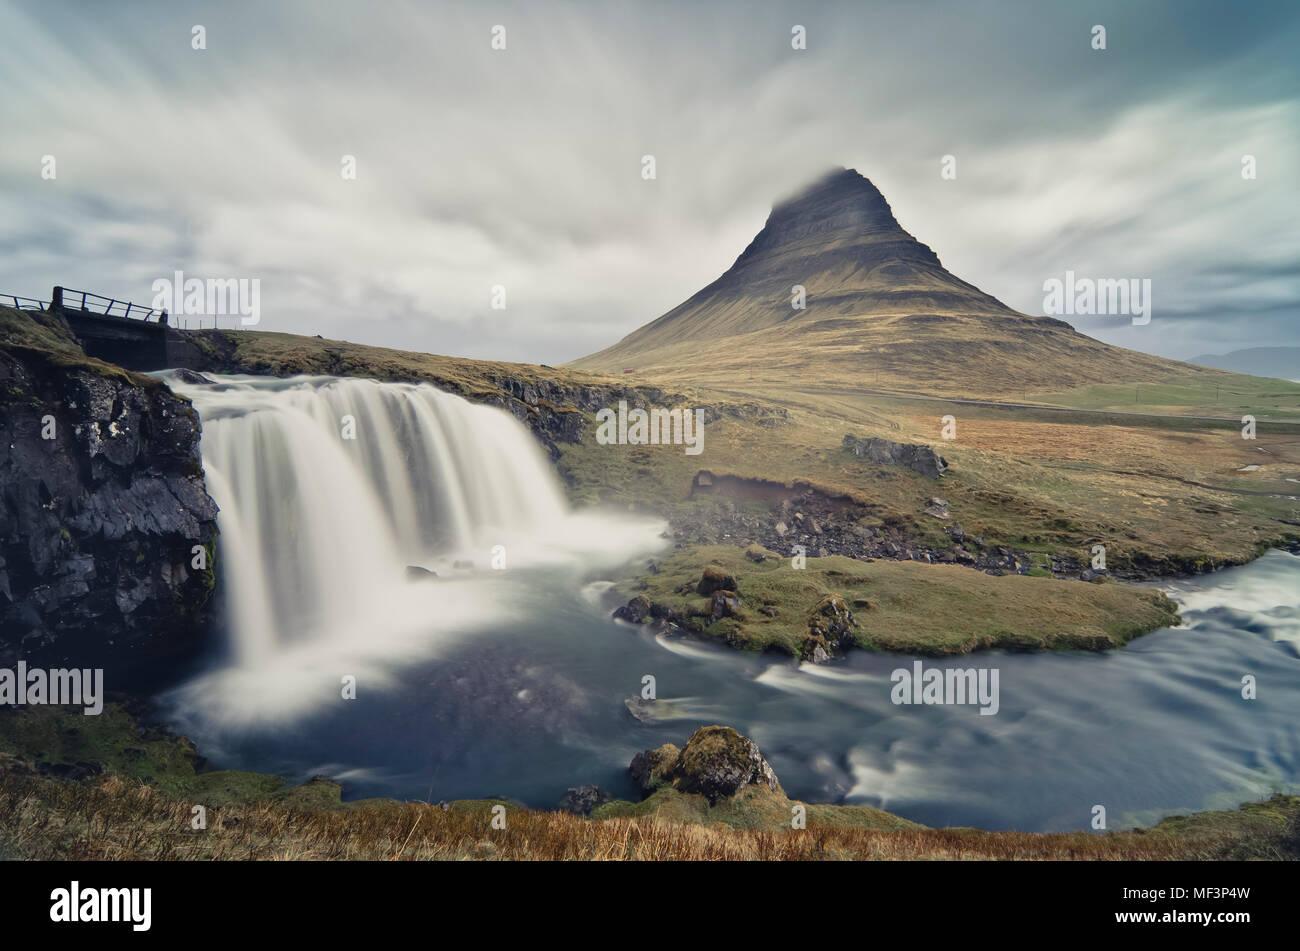 Iceland, Kirkjufellsfoss waterfall and Kirkjufell in the background - Stock Image